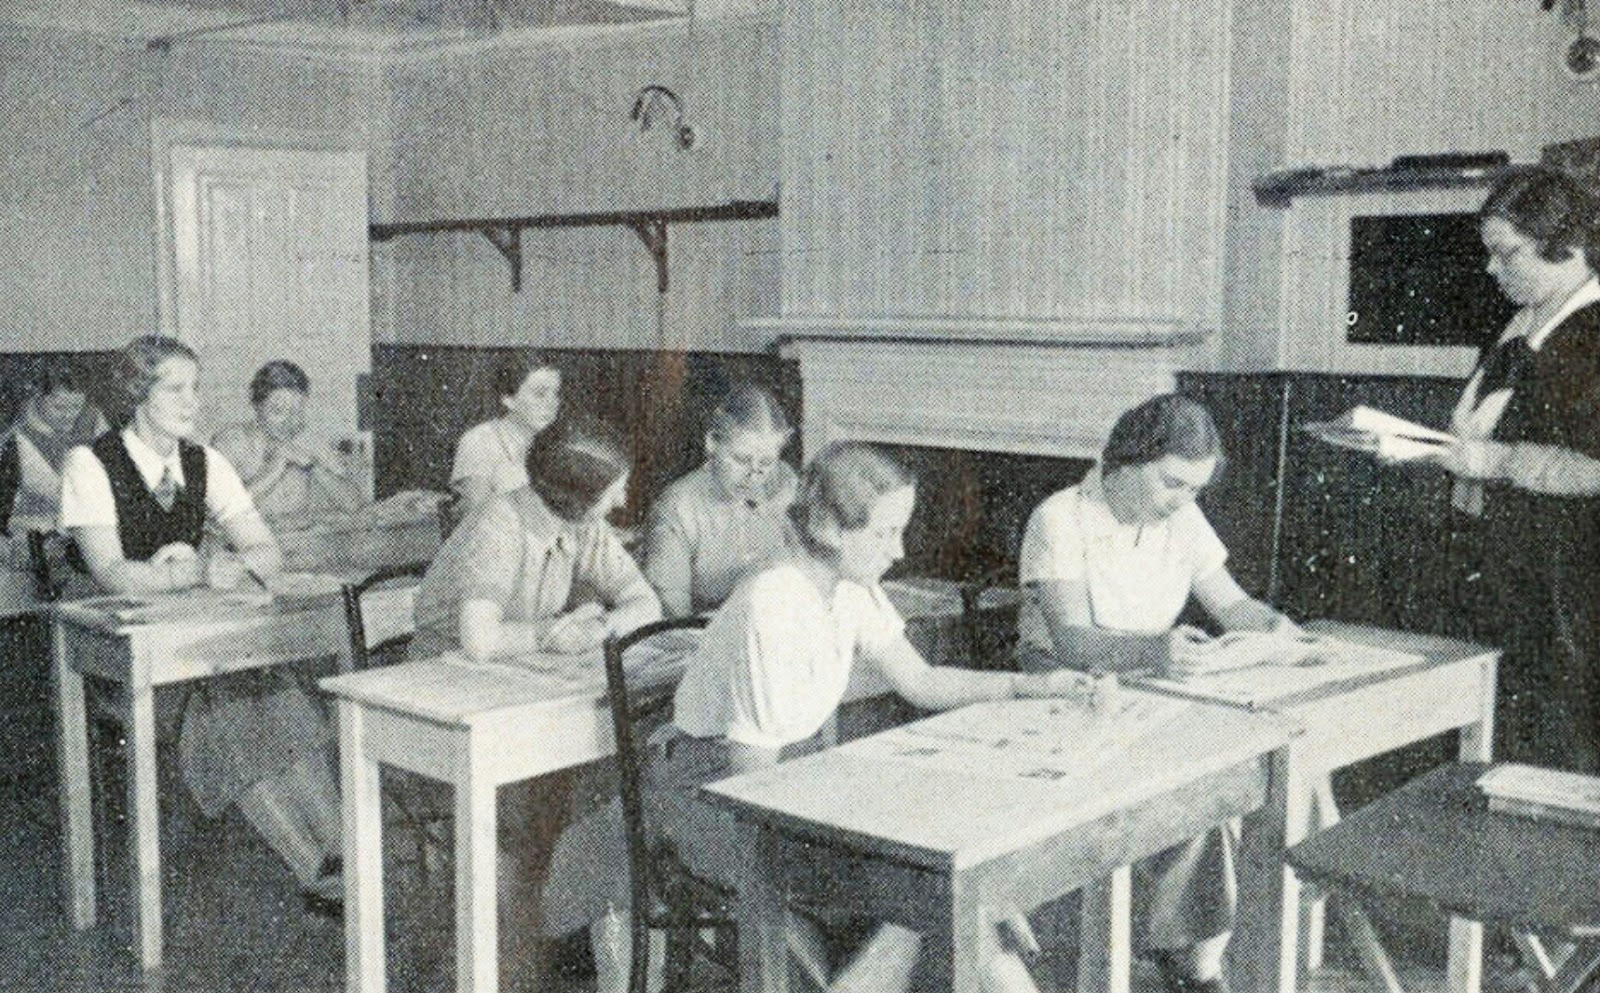 Augusta Victoria College